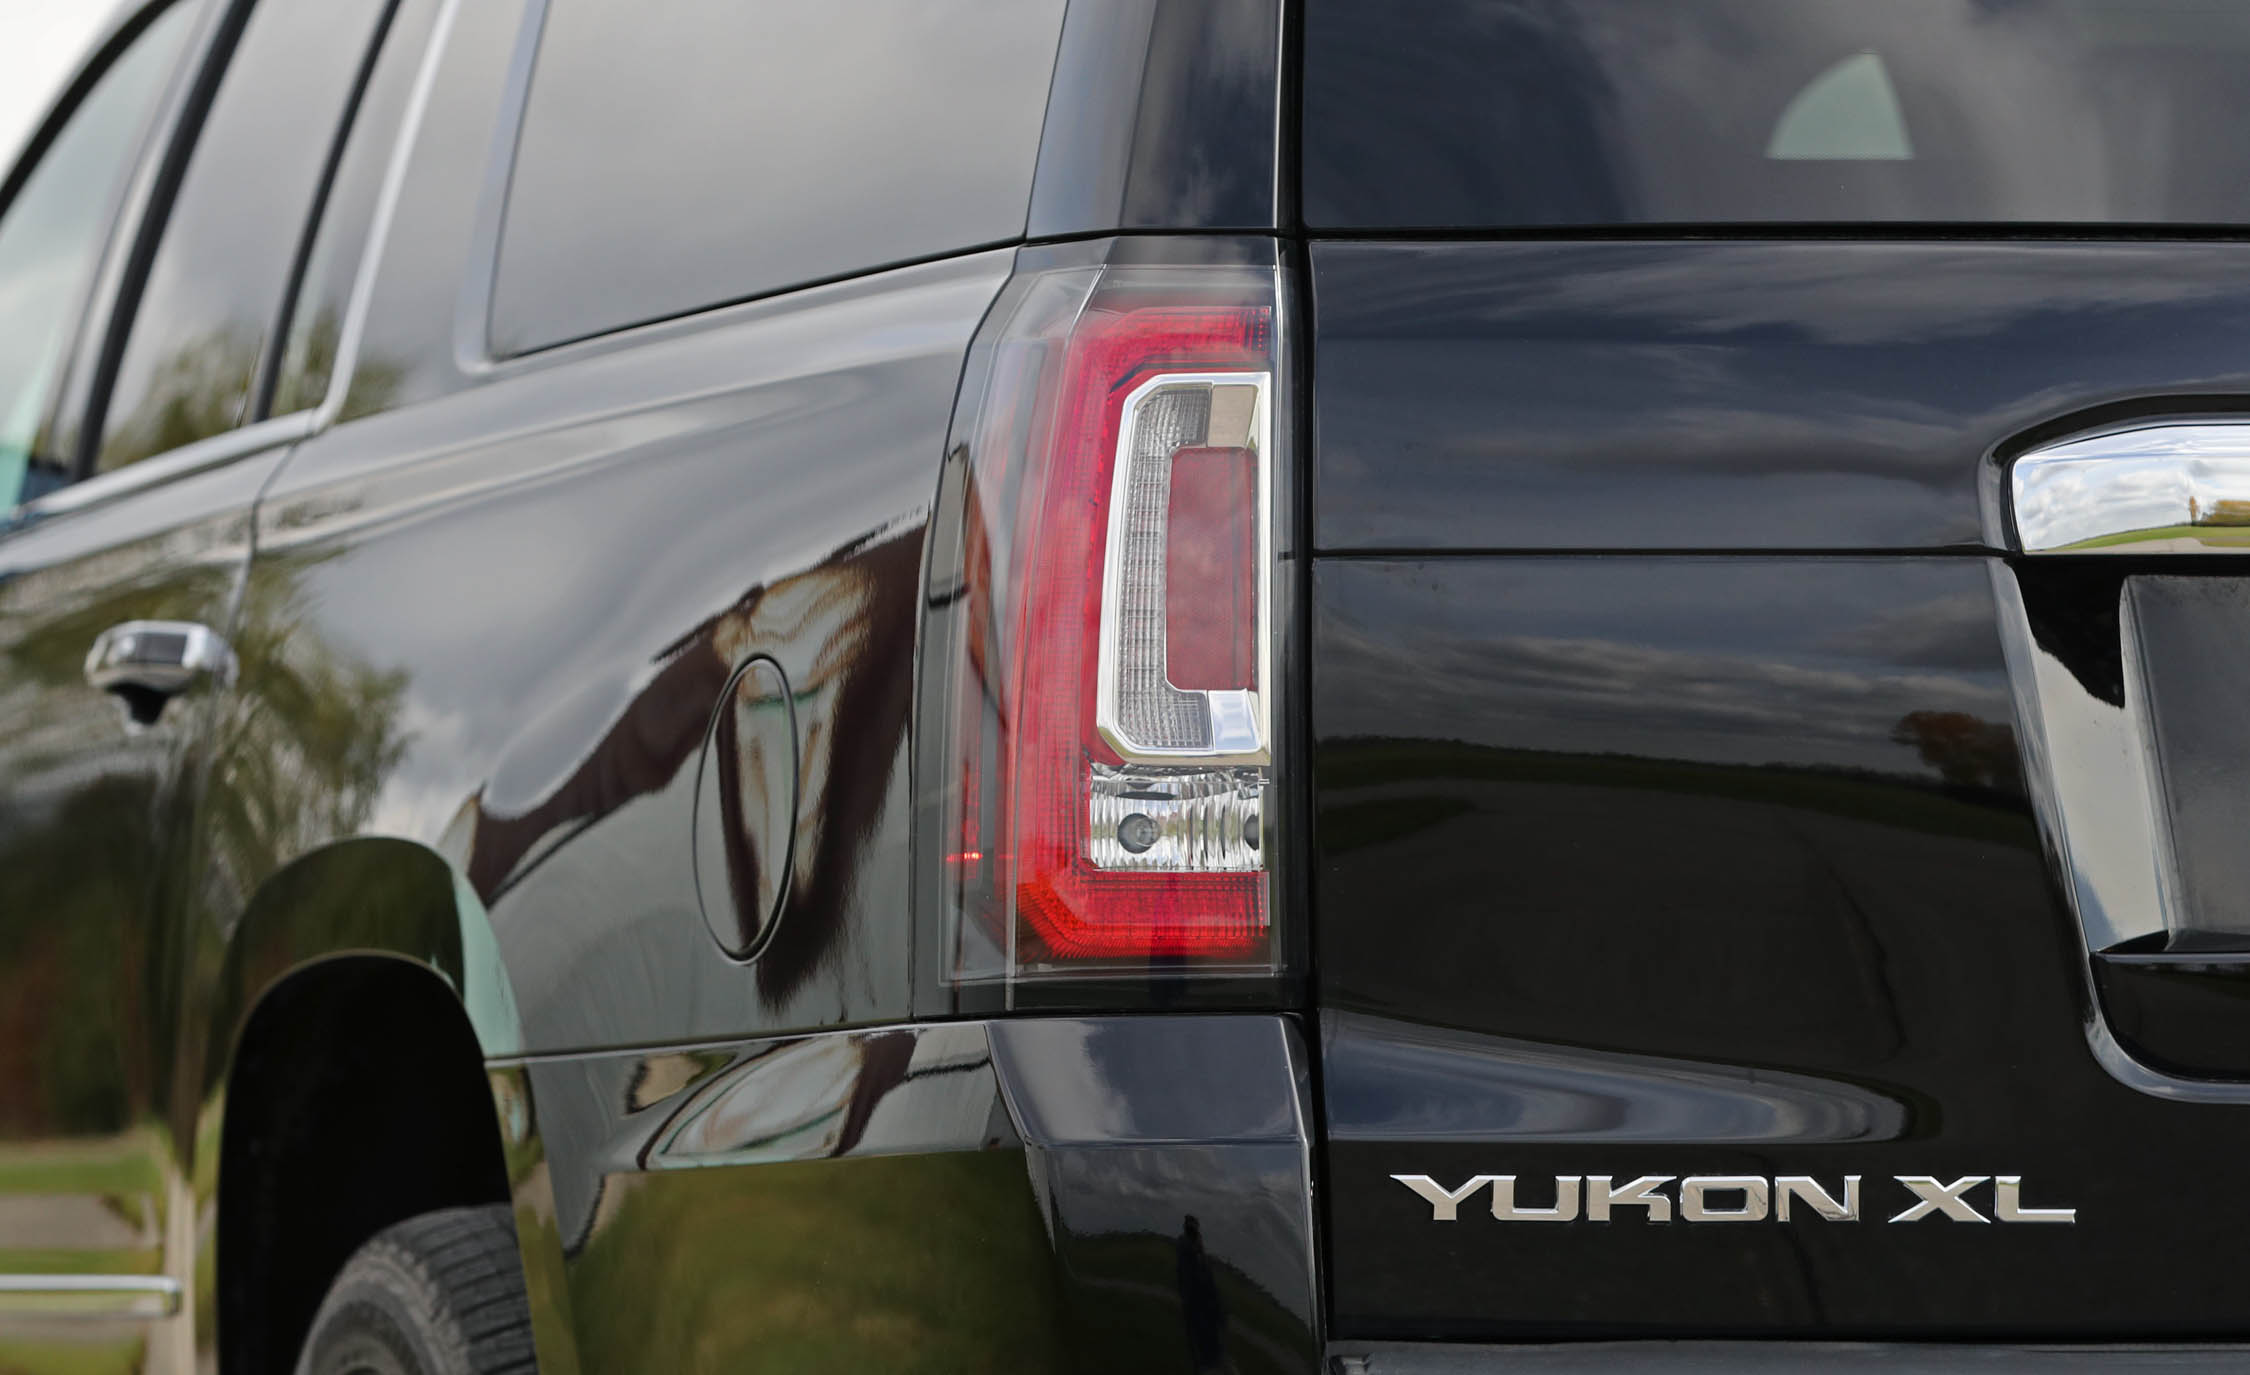 2017 Gmc Yukon Xl Denali Exterior View Taillight (View 19 of 26)